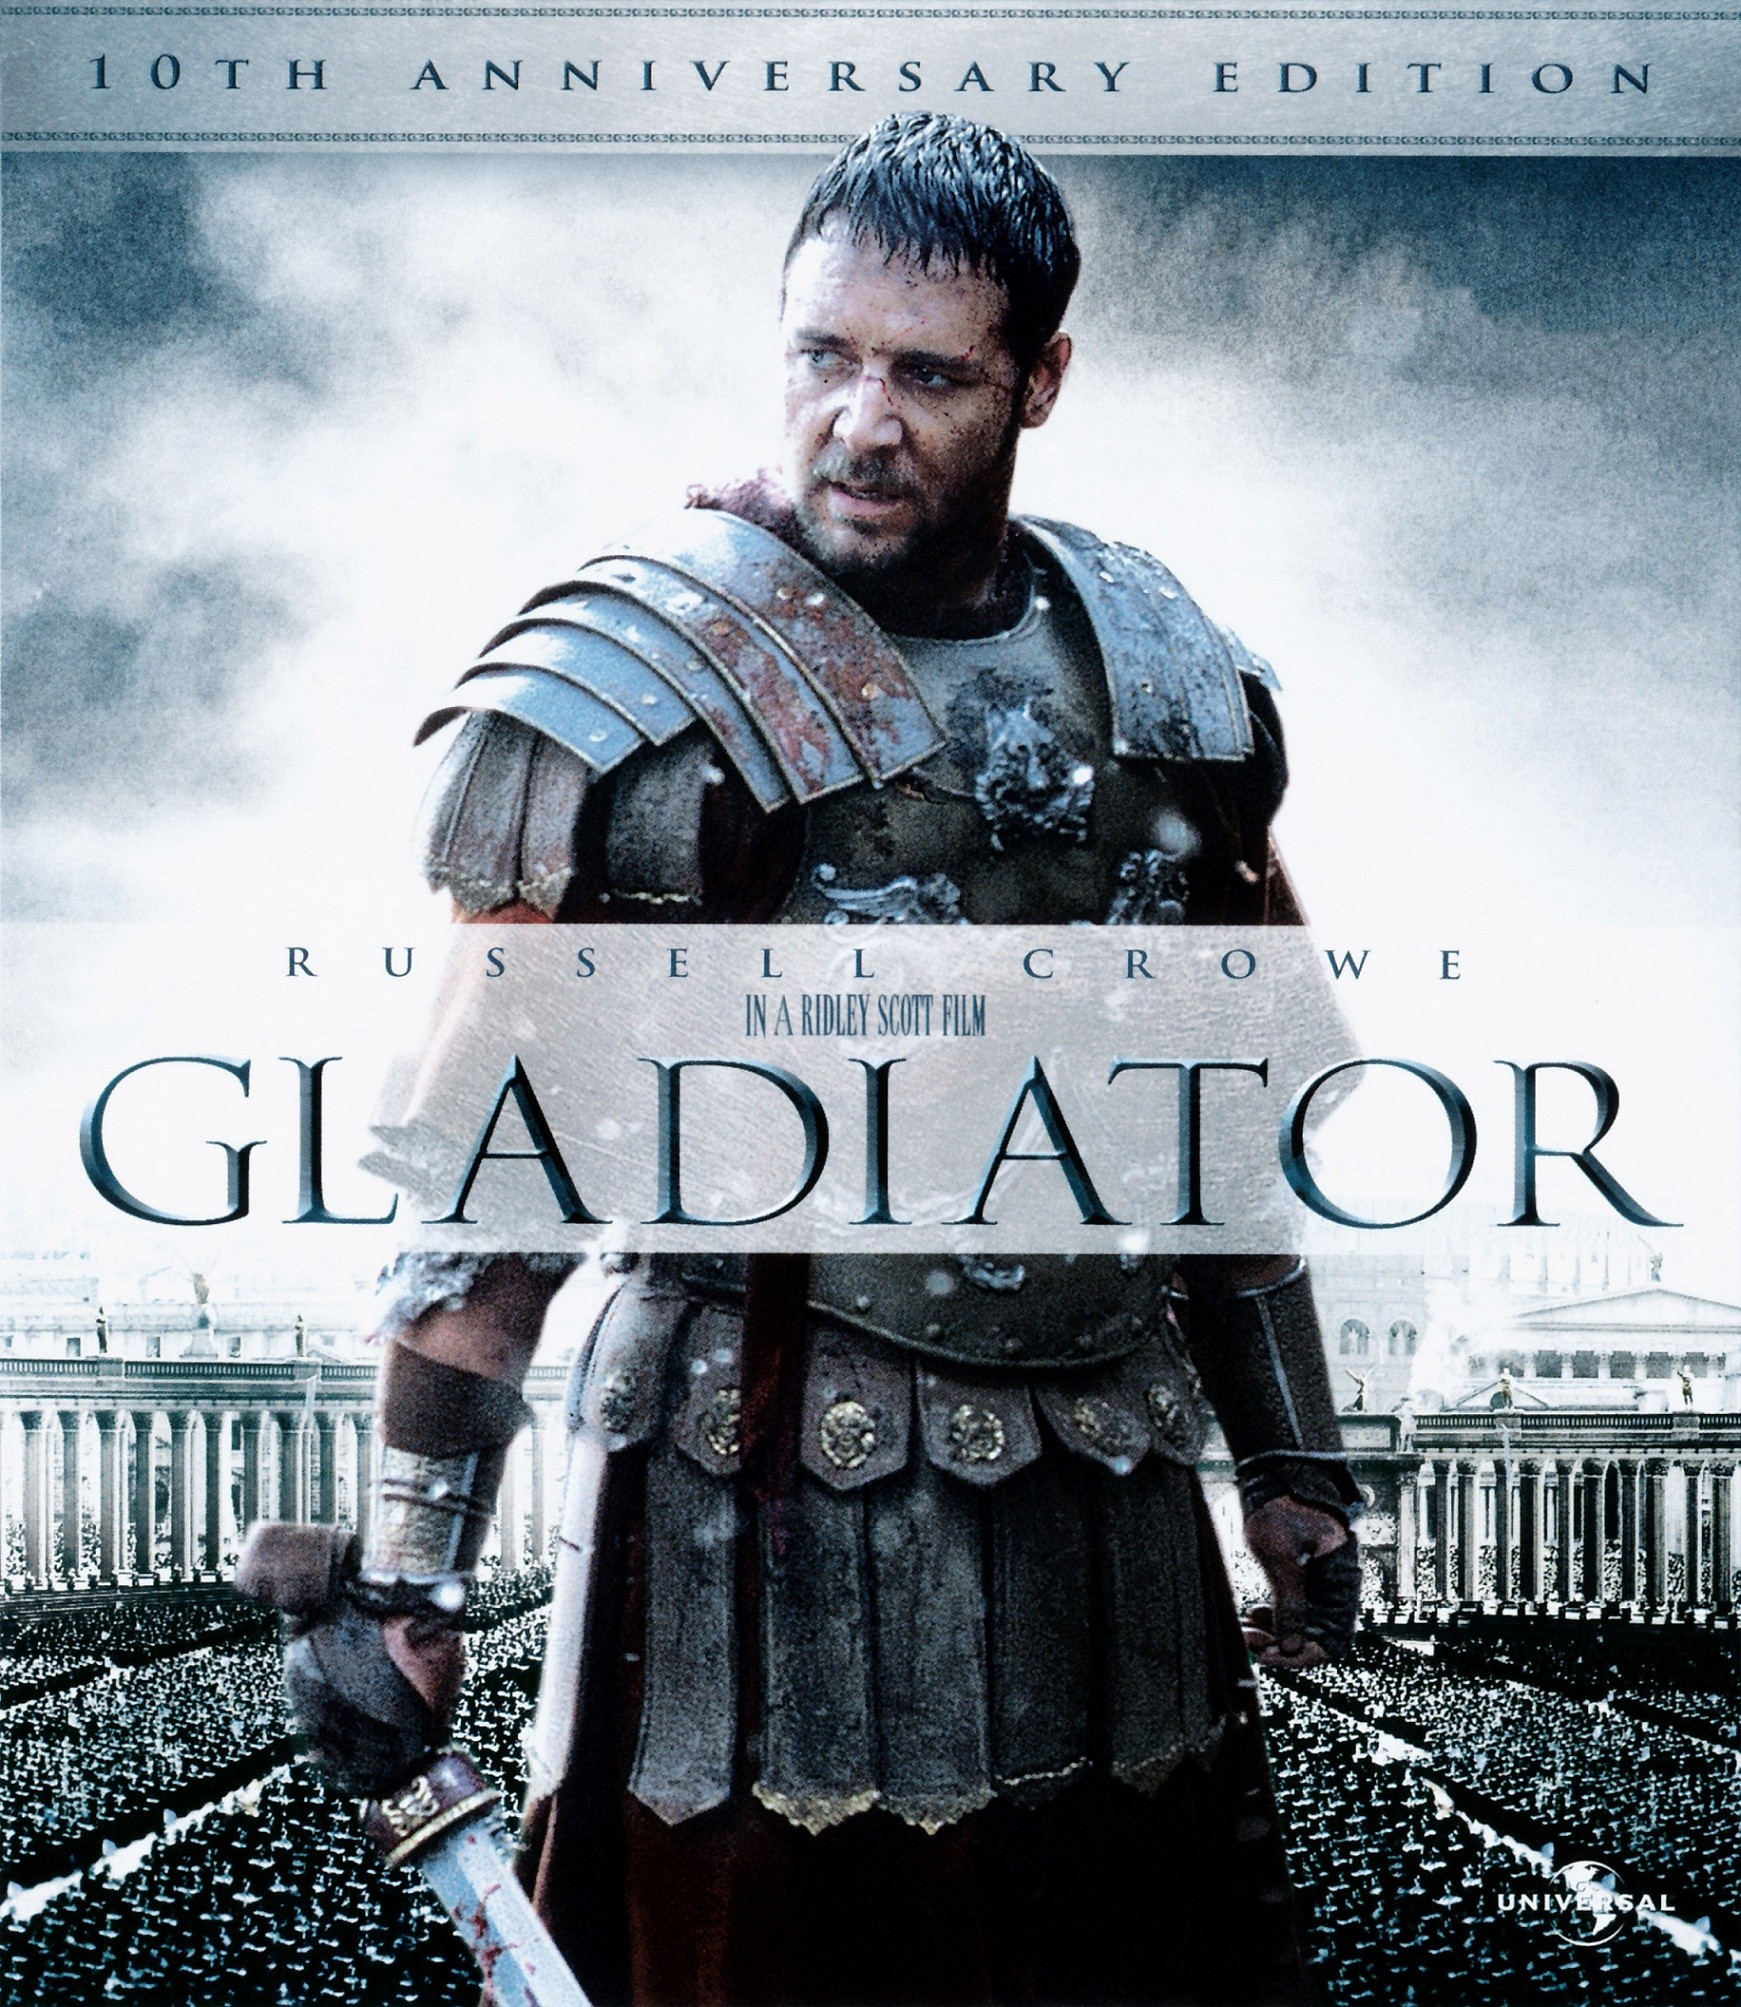 Watch Movie Gladiator Online Streaming